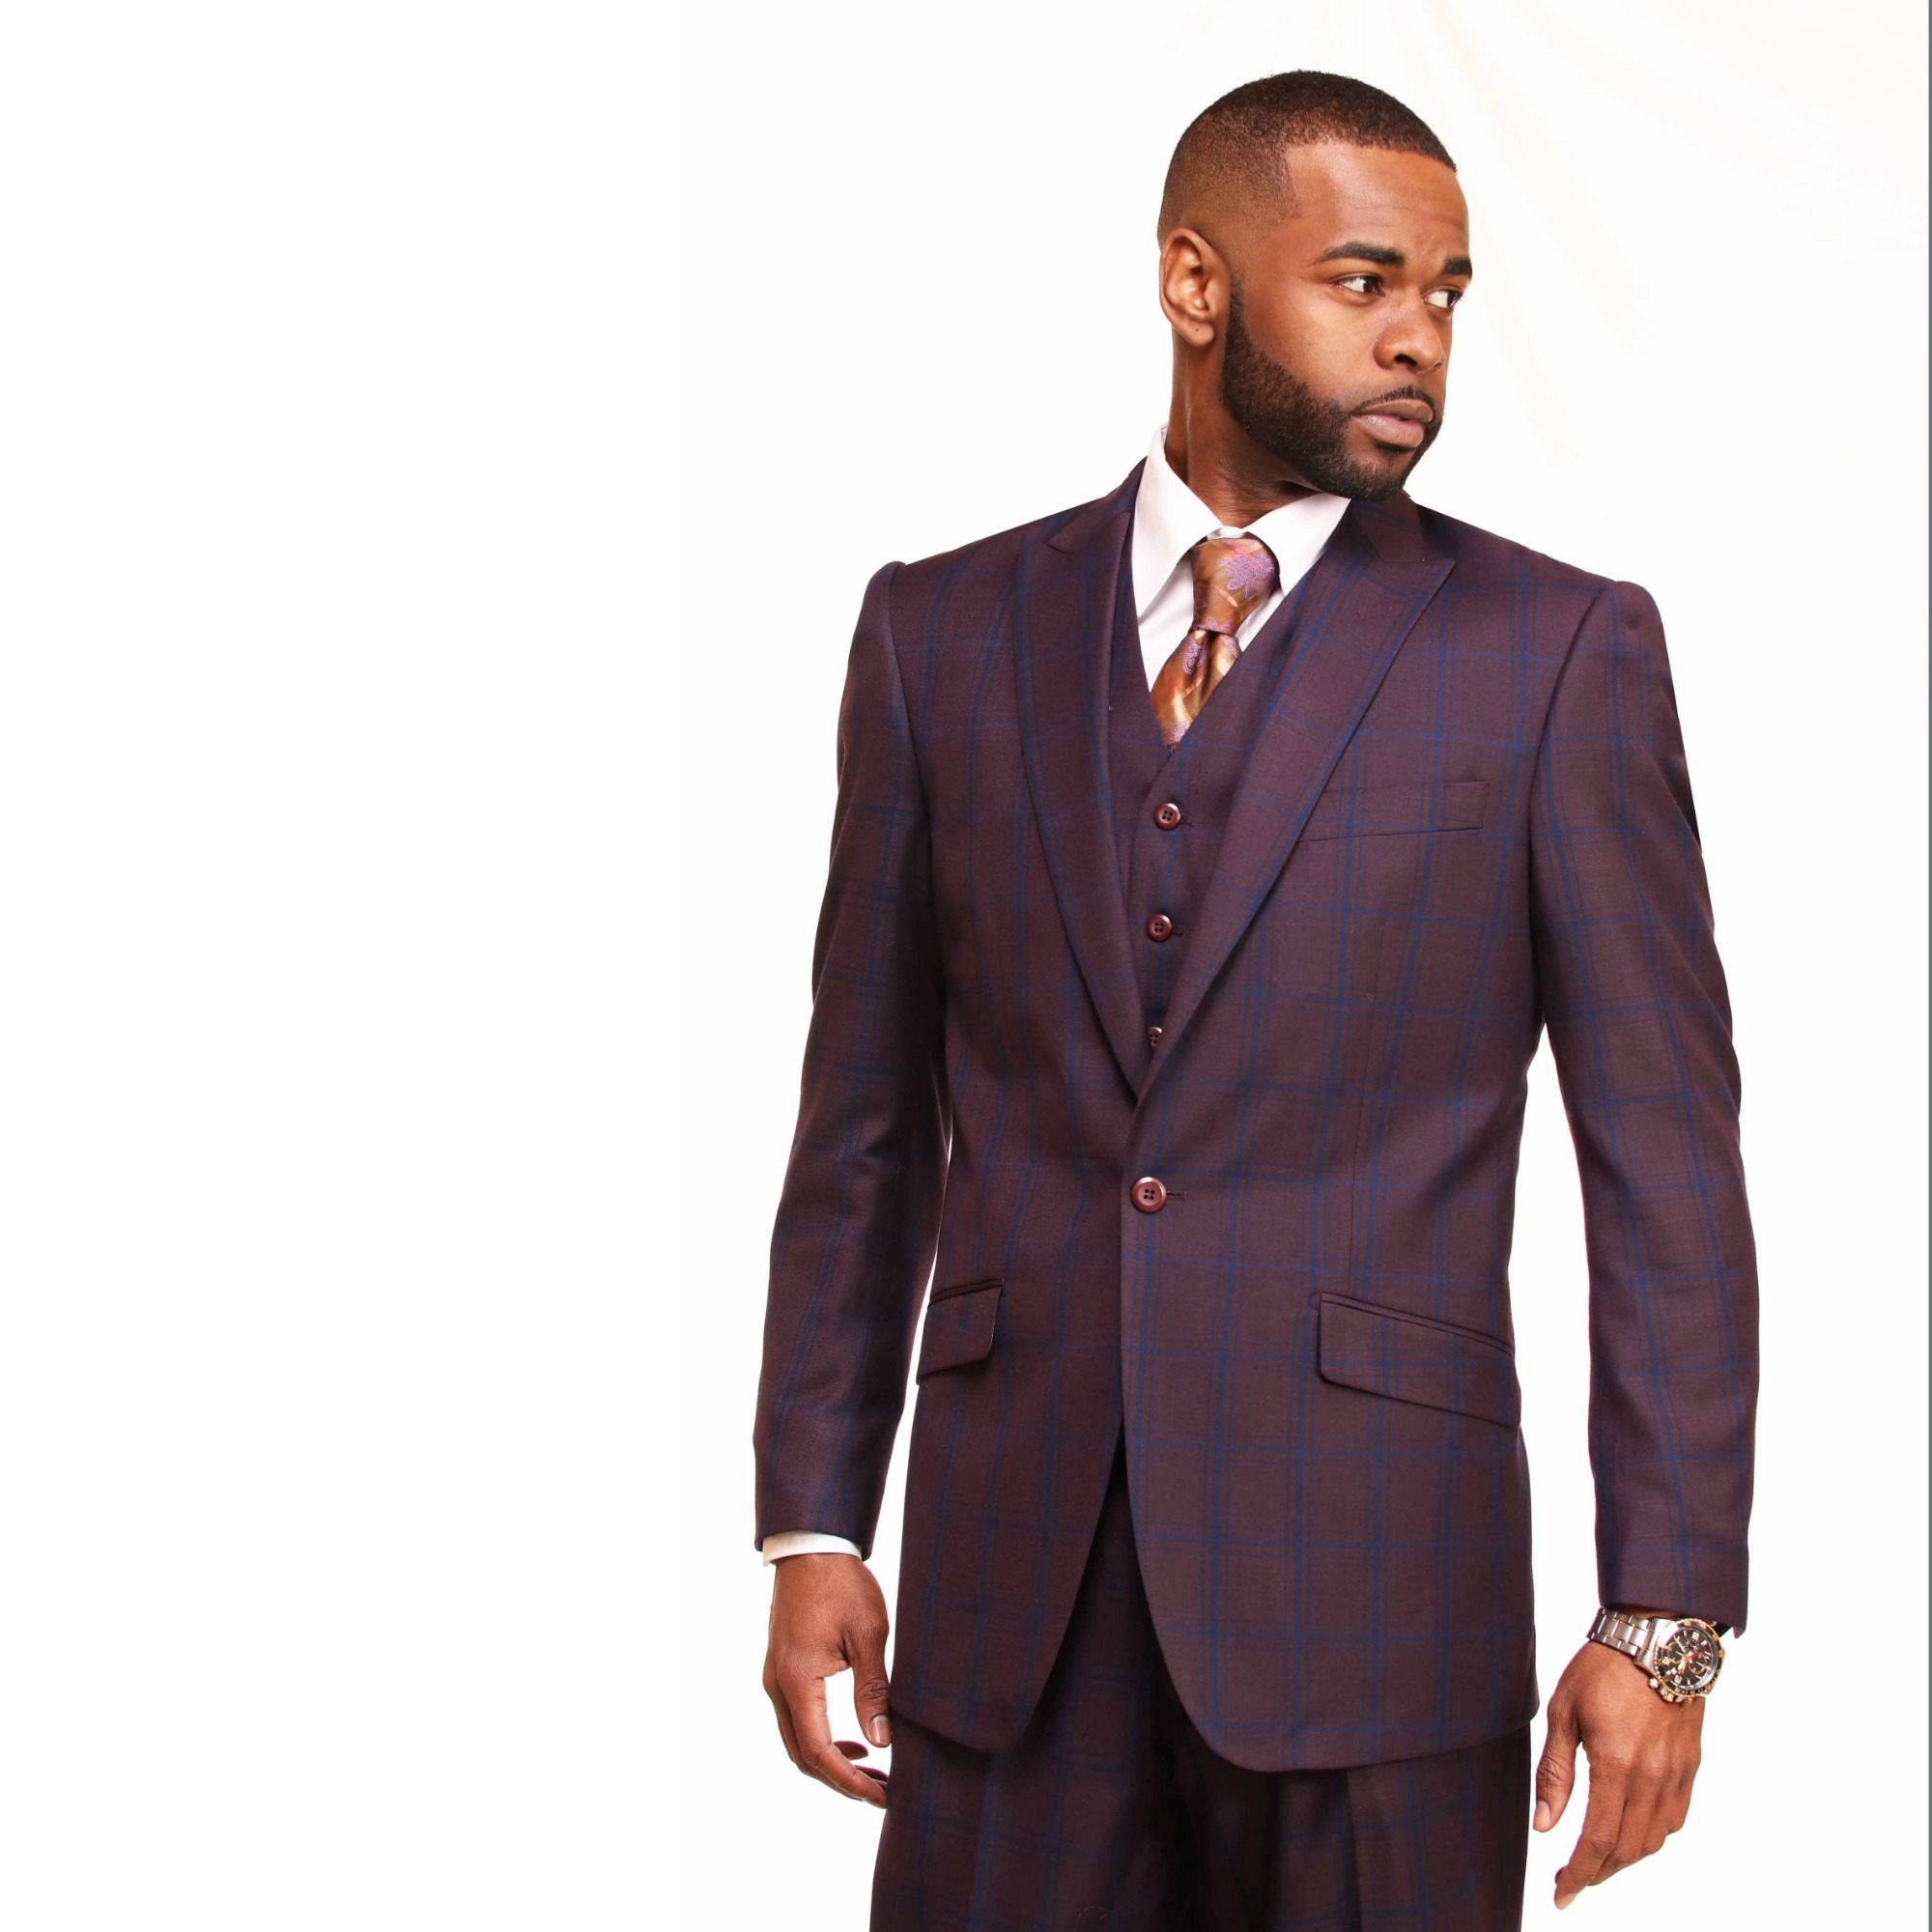 Burgundy 3 piece Suit